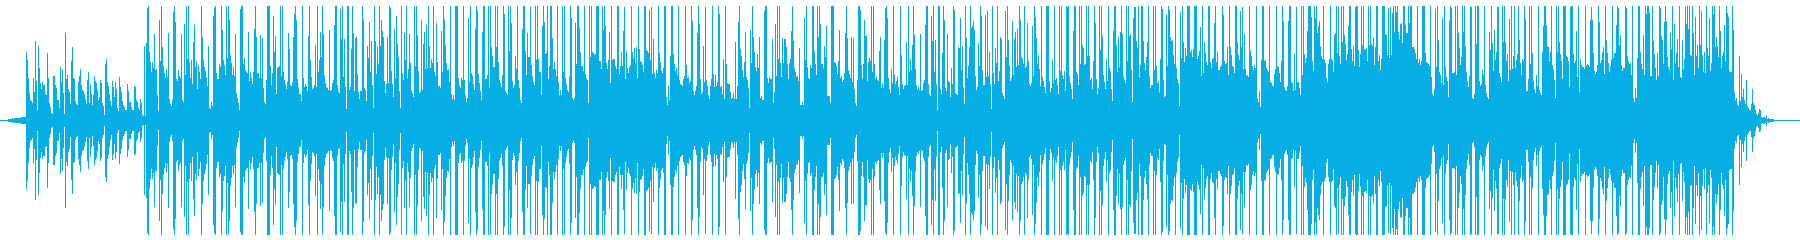 BGM用夕暮れが似合うバラードの再生済みの波形